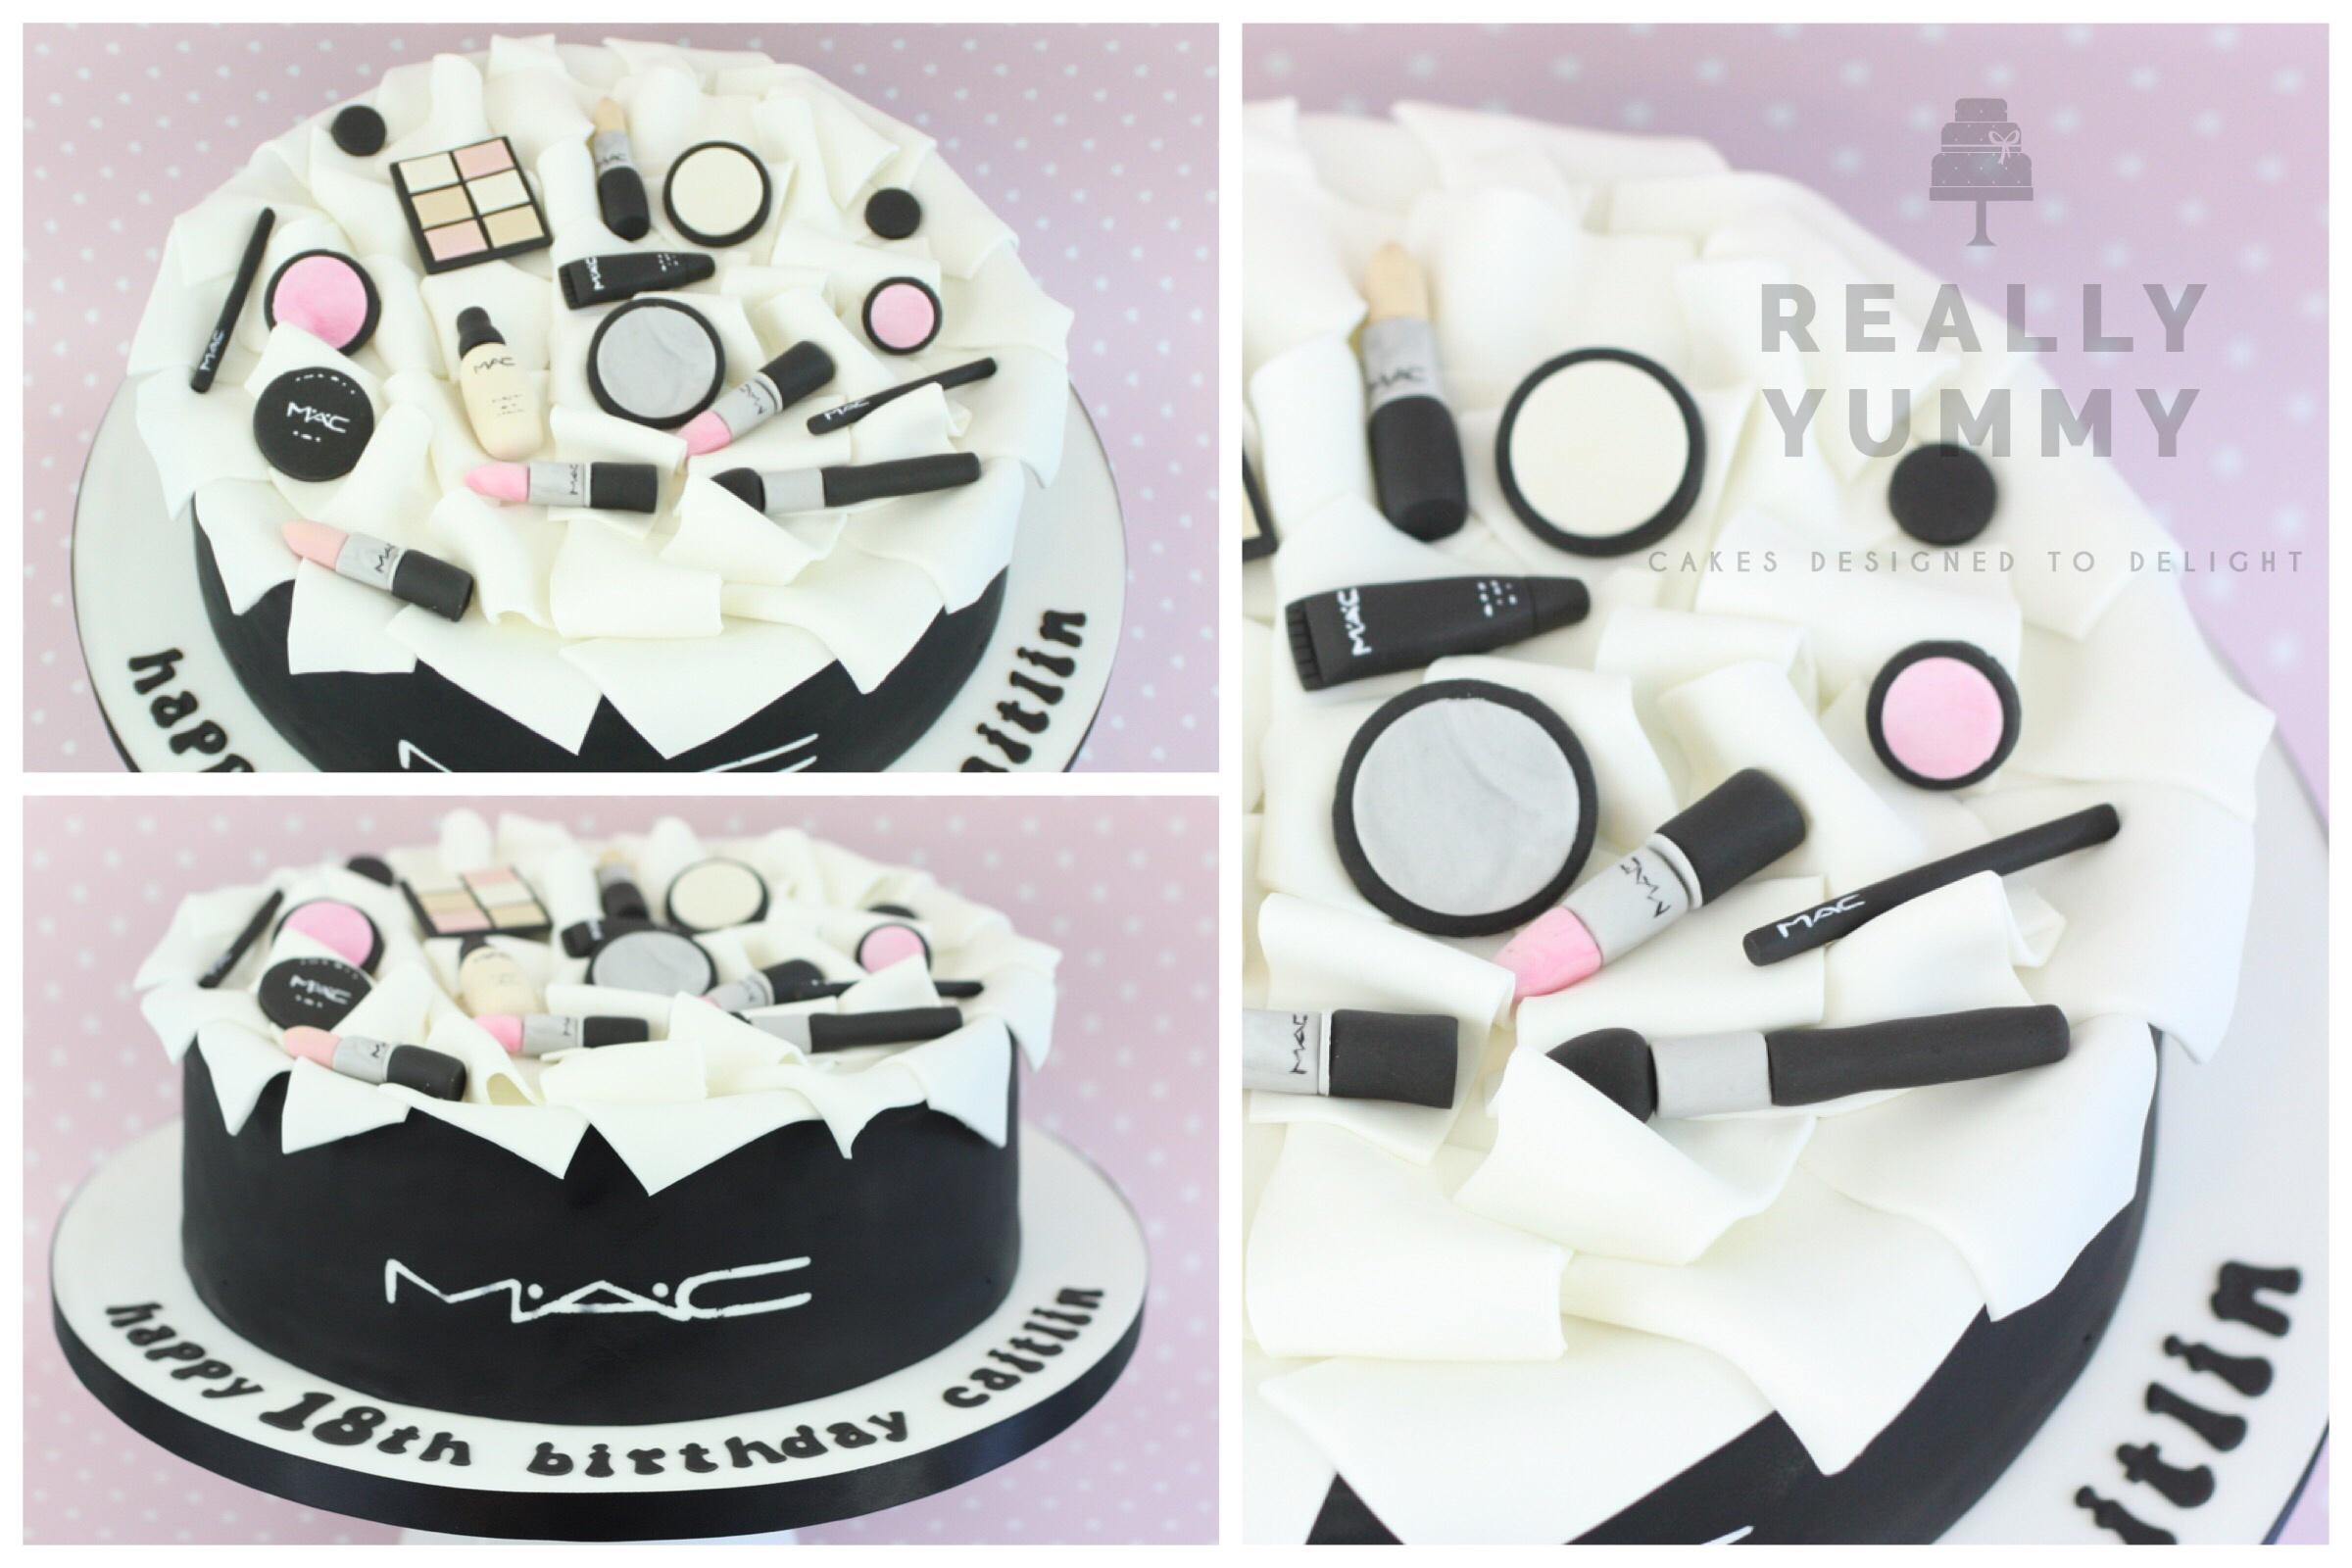 A gorgeous MAC make-up cake